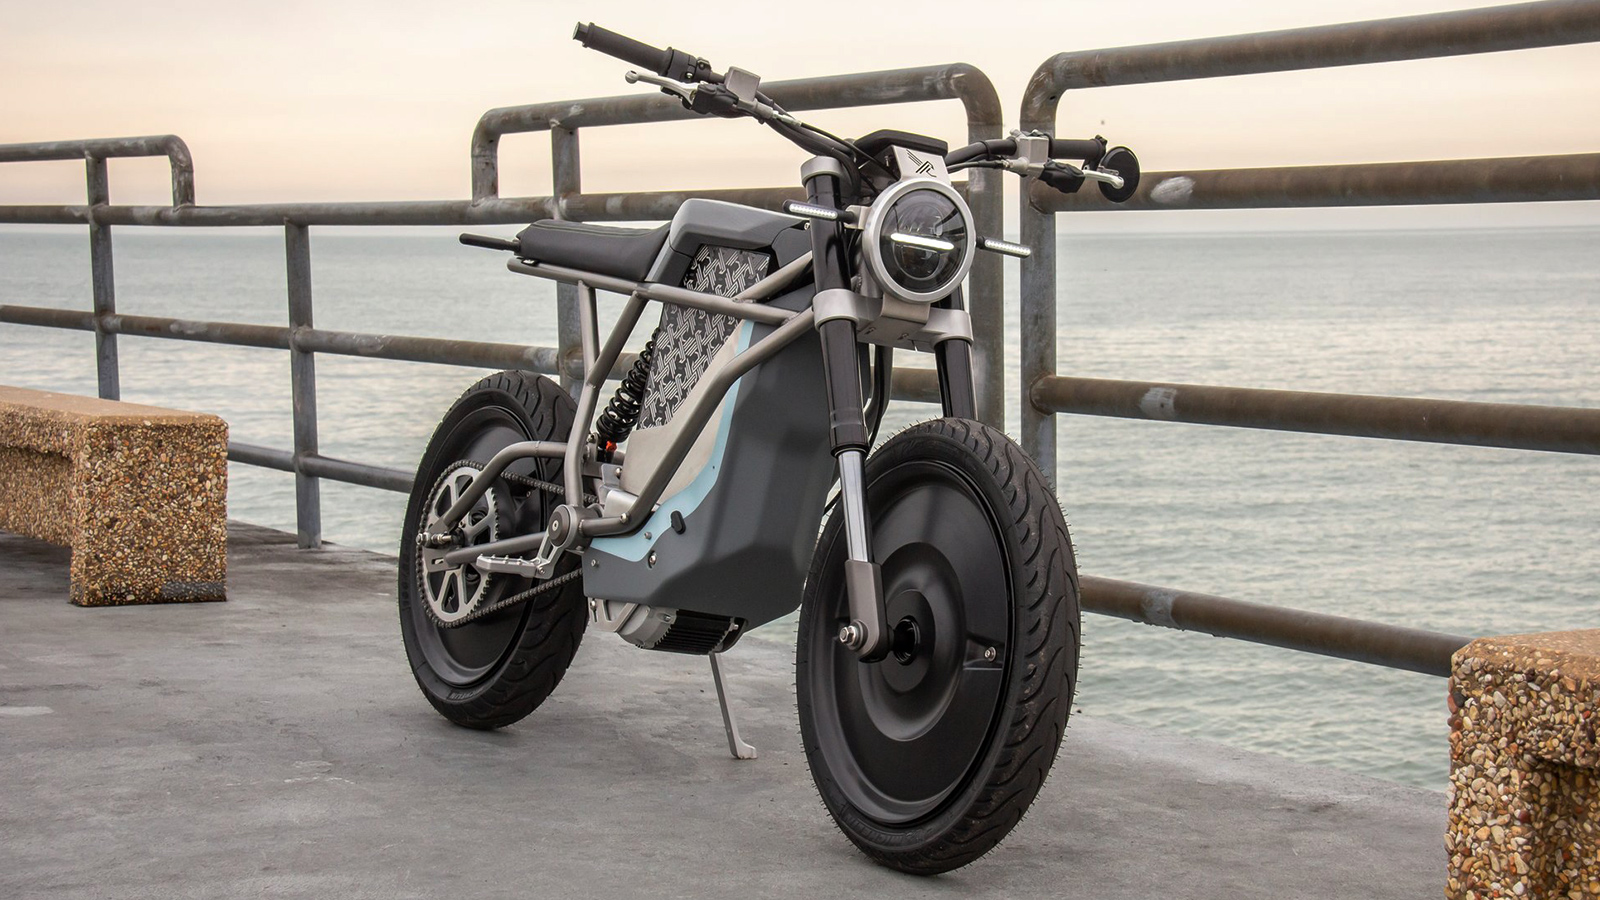 Cleveland Speedshop Falcon BLK Motorcycle